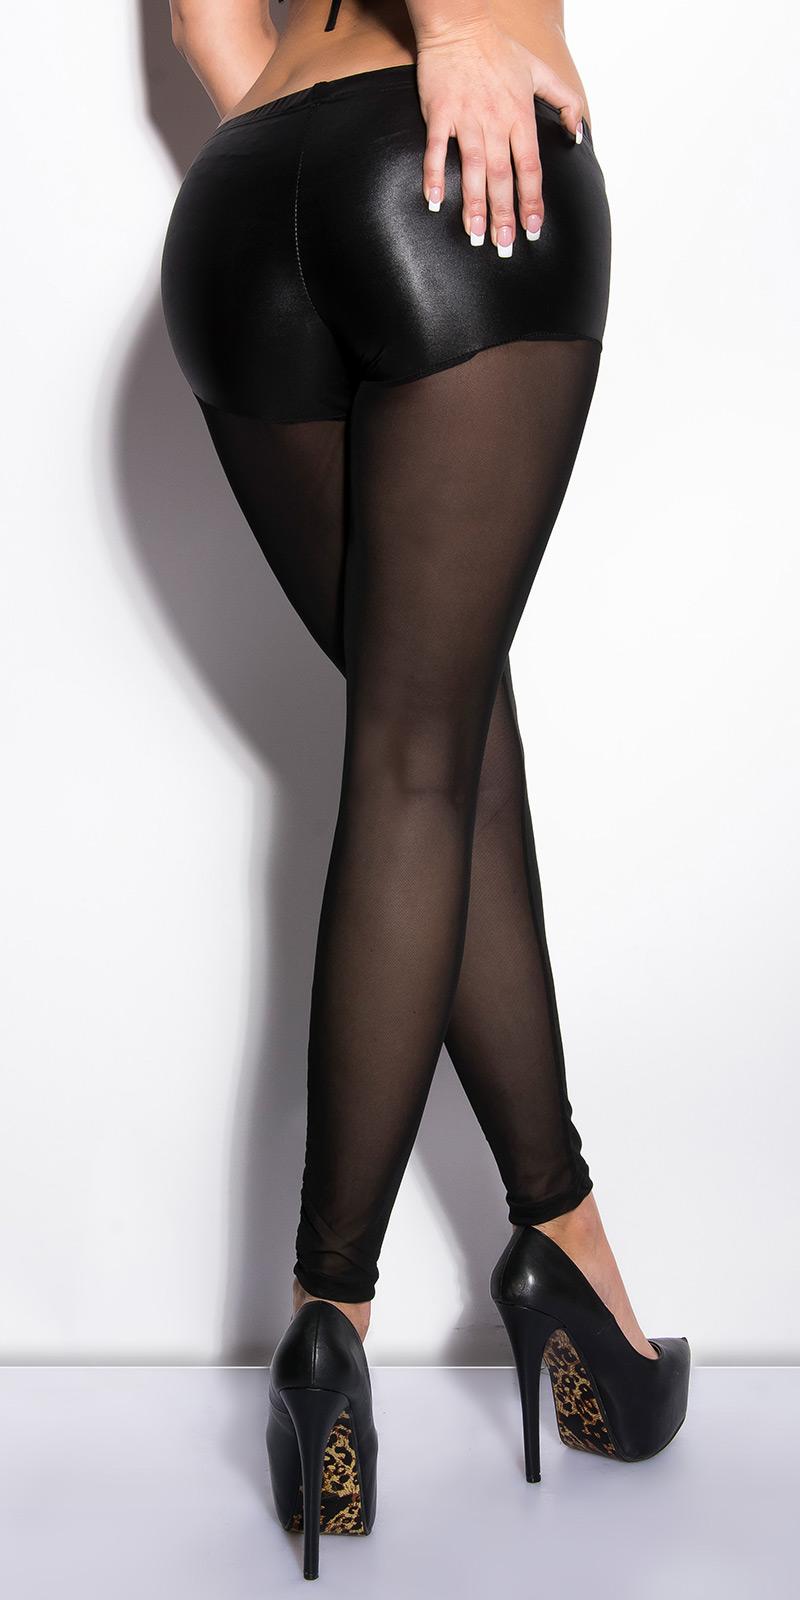 IN505271 Leggings Pantacollant a Short WetLook e Gambe Nude Velate in Microrete